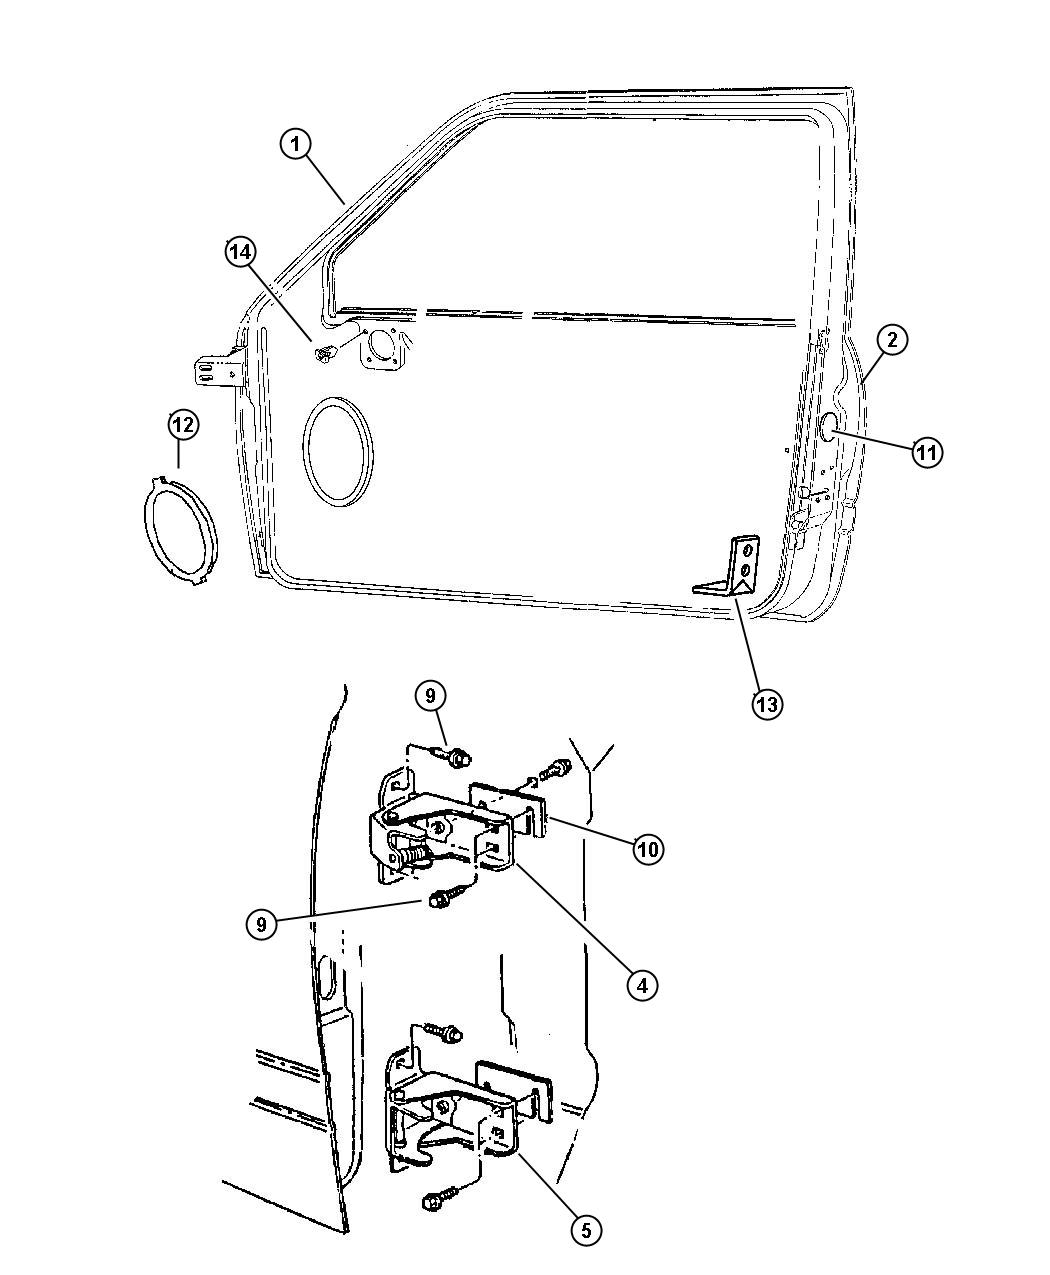 Dodge Ram Door Front Shell And Hinges